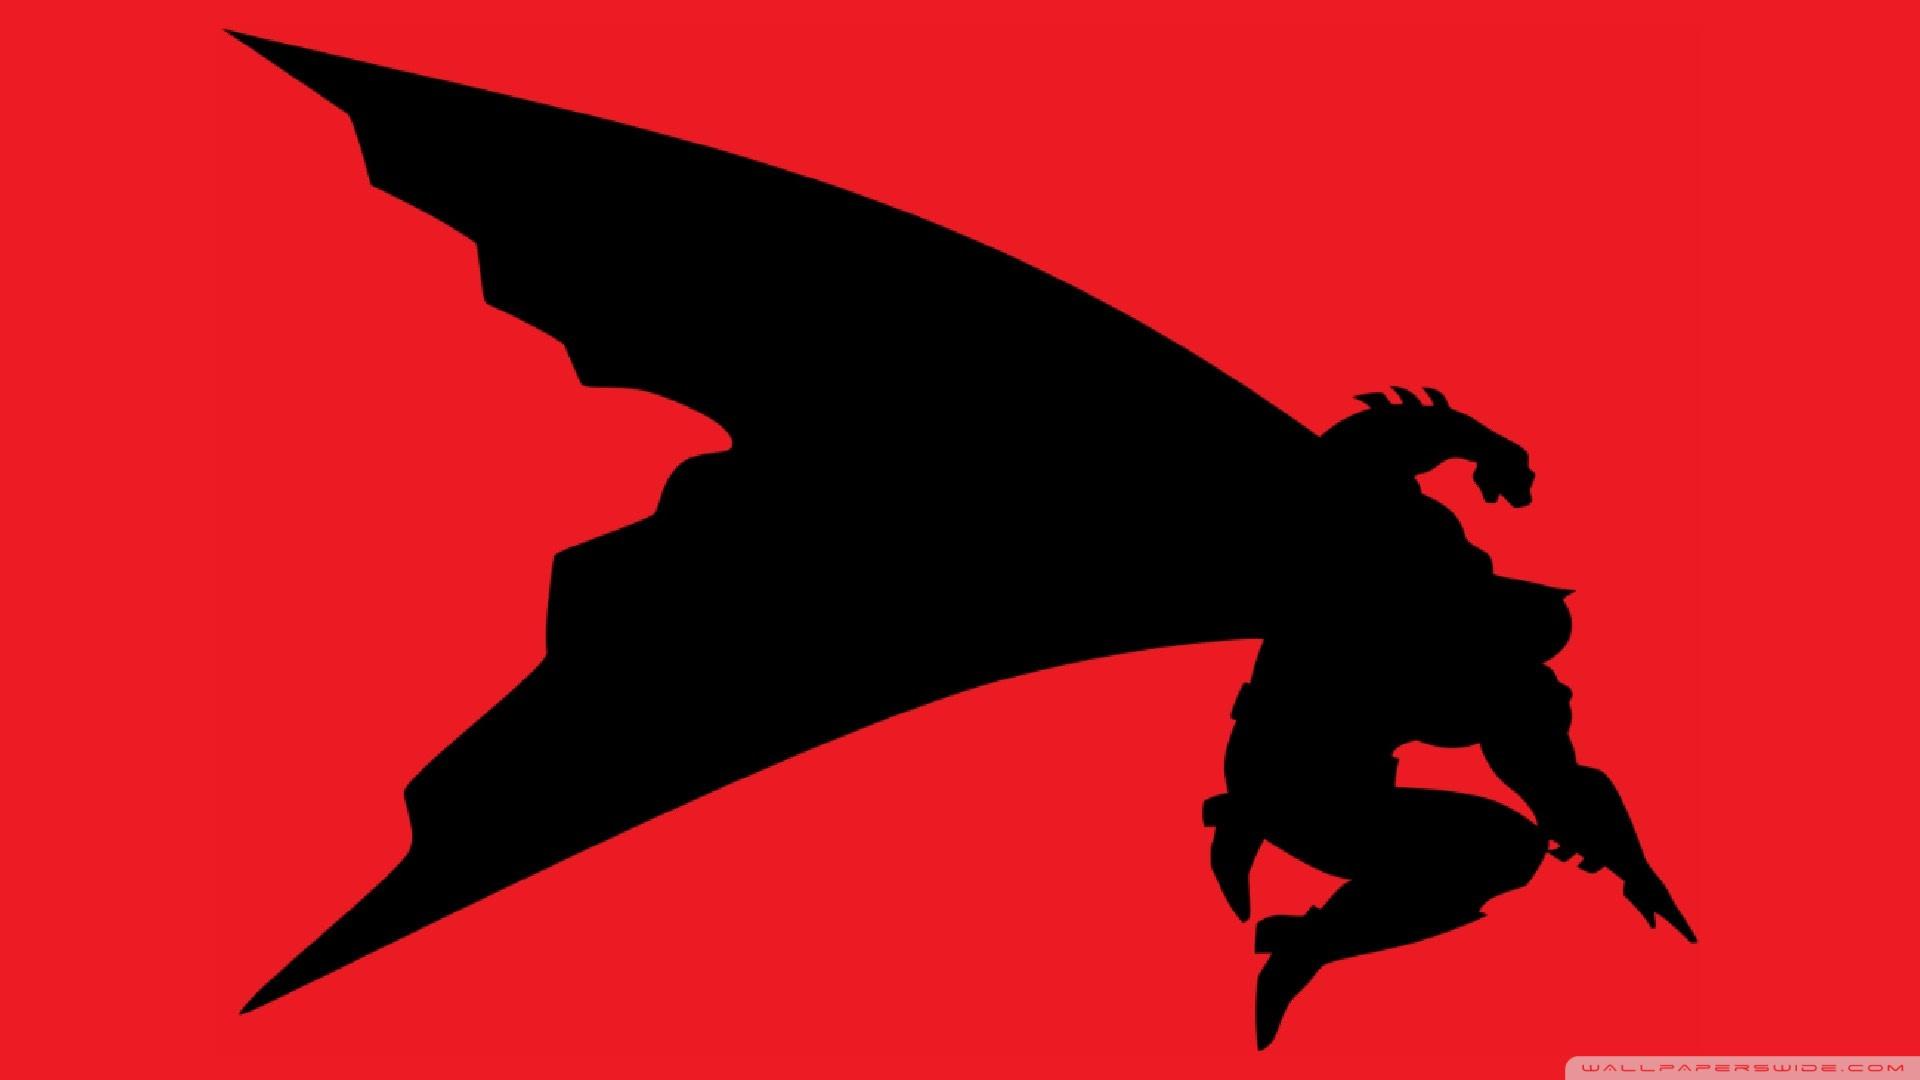 Batman Dark Knight Returns Ultra Hd Desktop Background Wallpaper